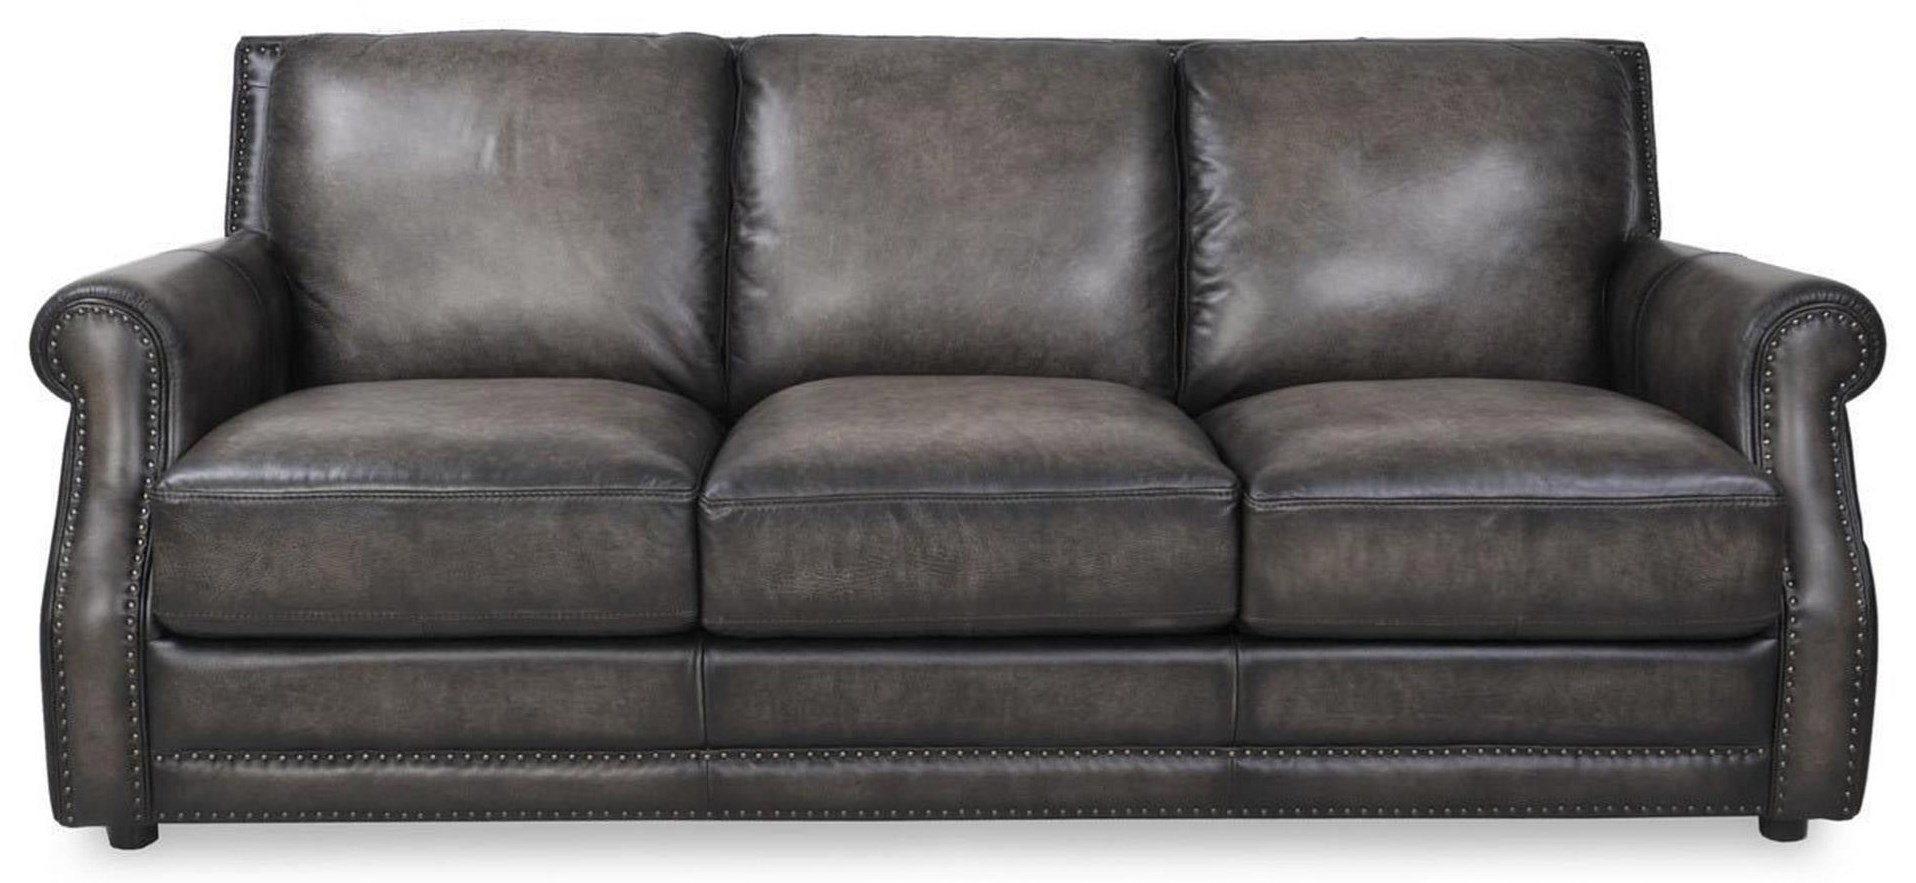 Charcoal Leather Sofa